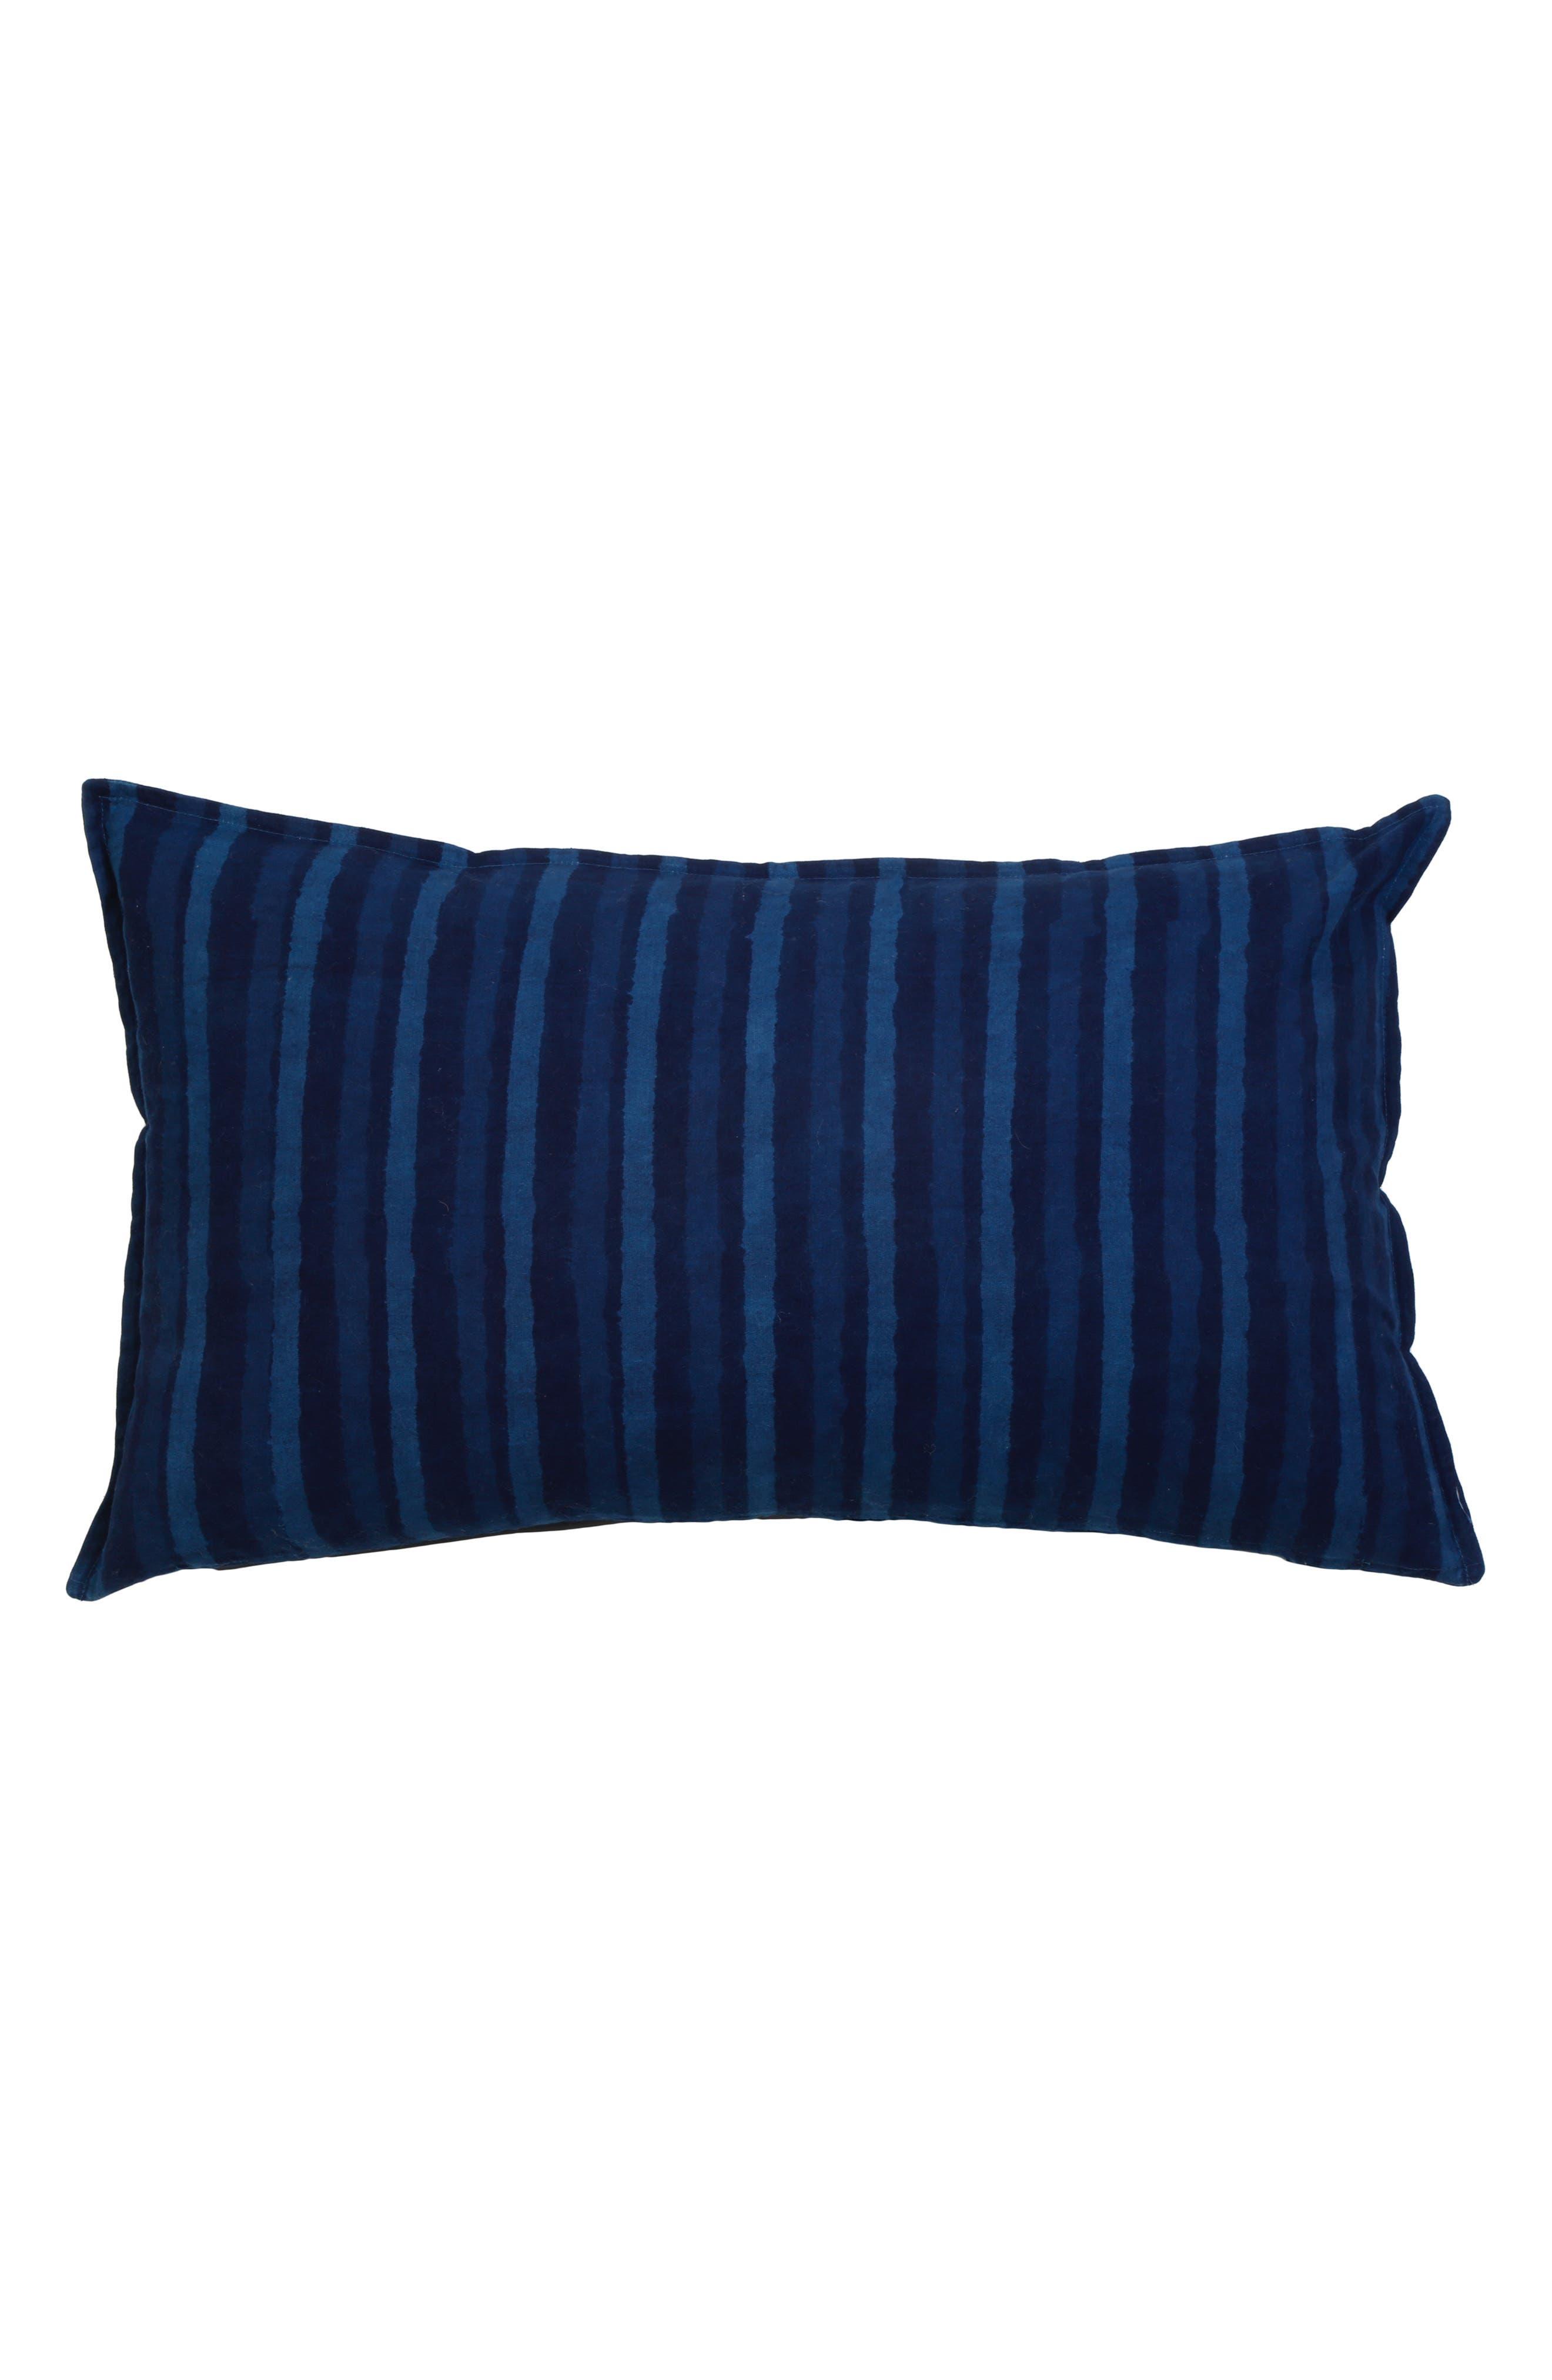 Indigo Stripe Accent Pillow,                         Main,                         color, 400